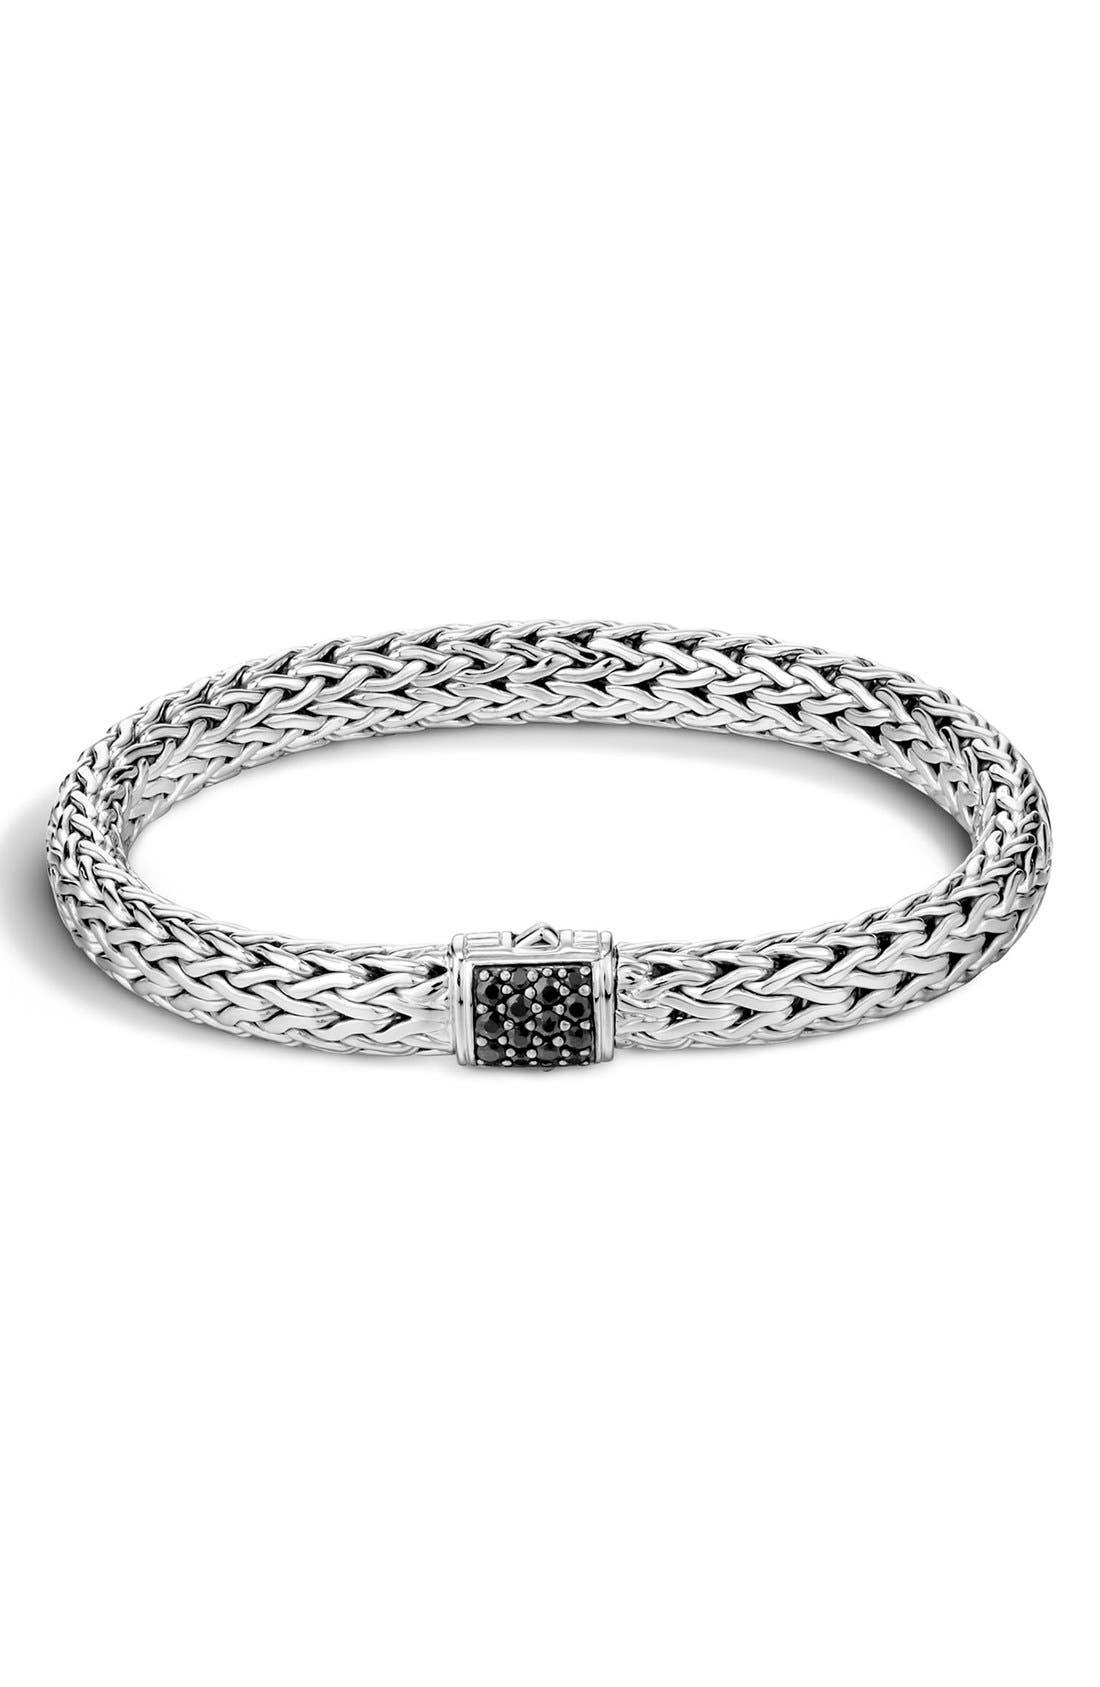 John Hardy 'Classic Chain' Sapphire Medium Bracelet